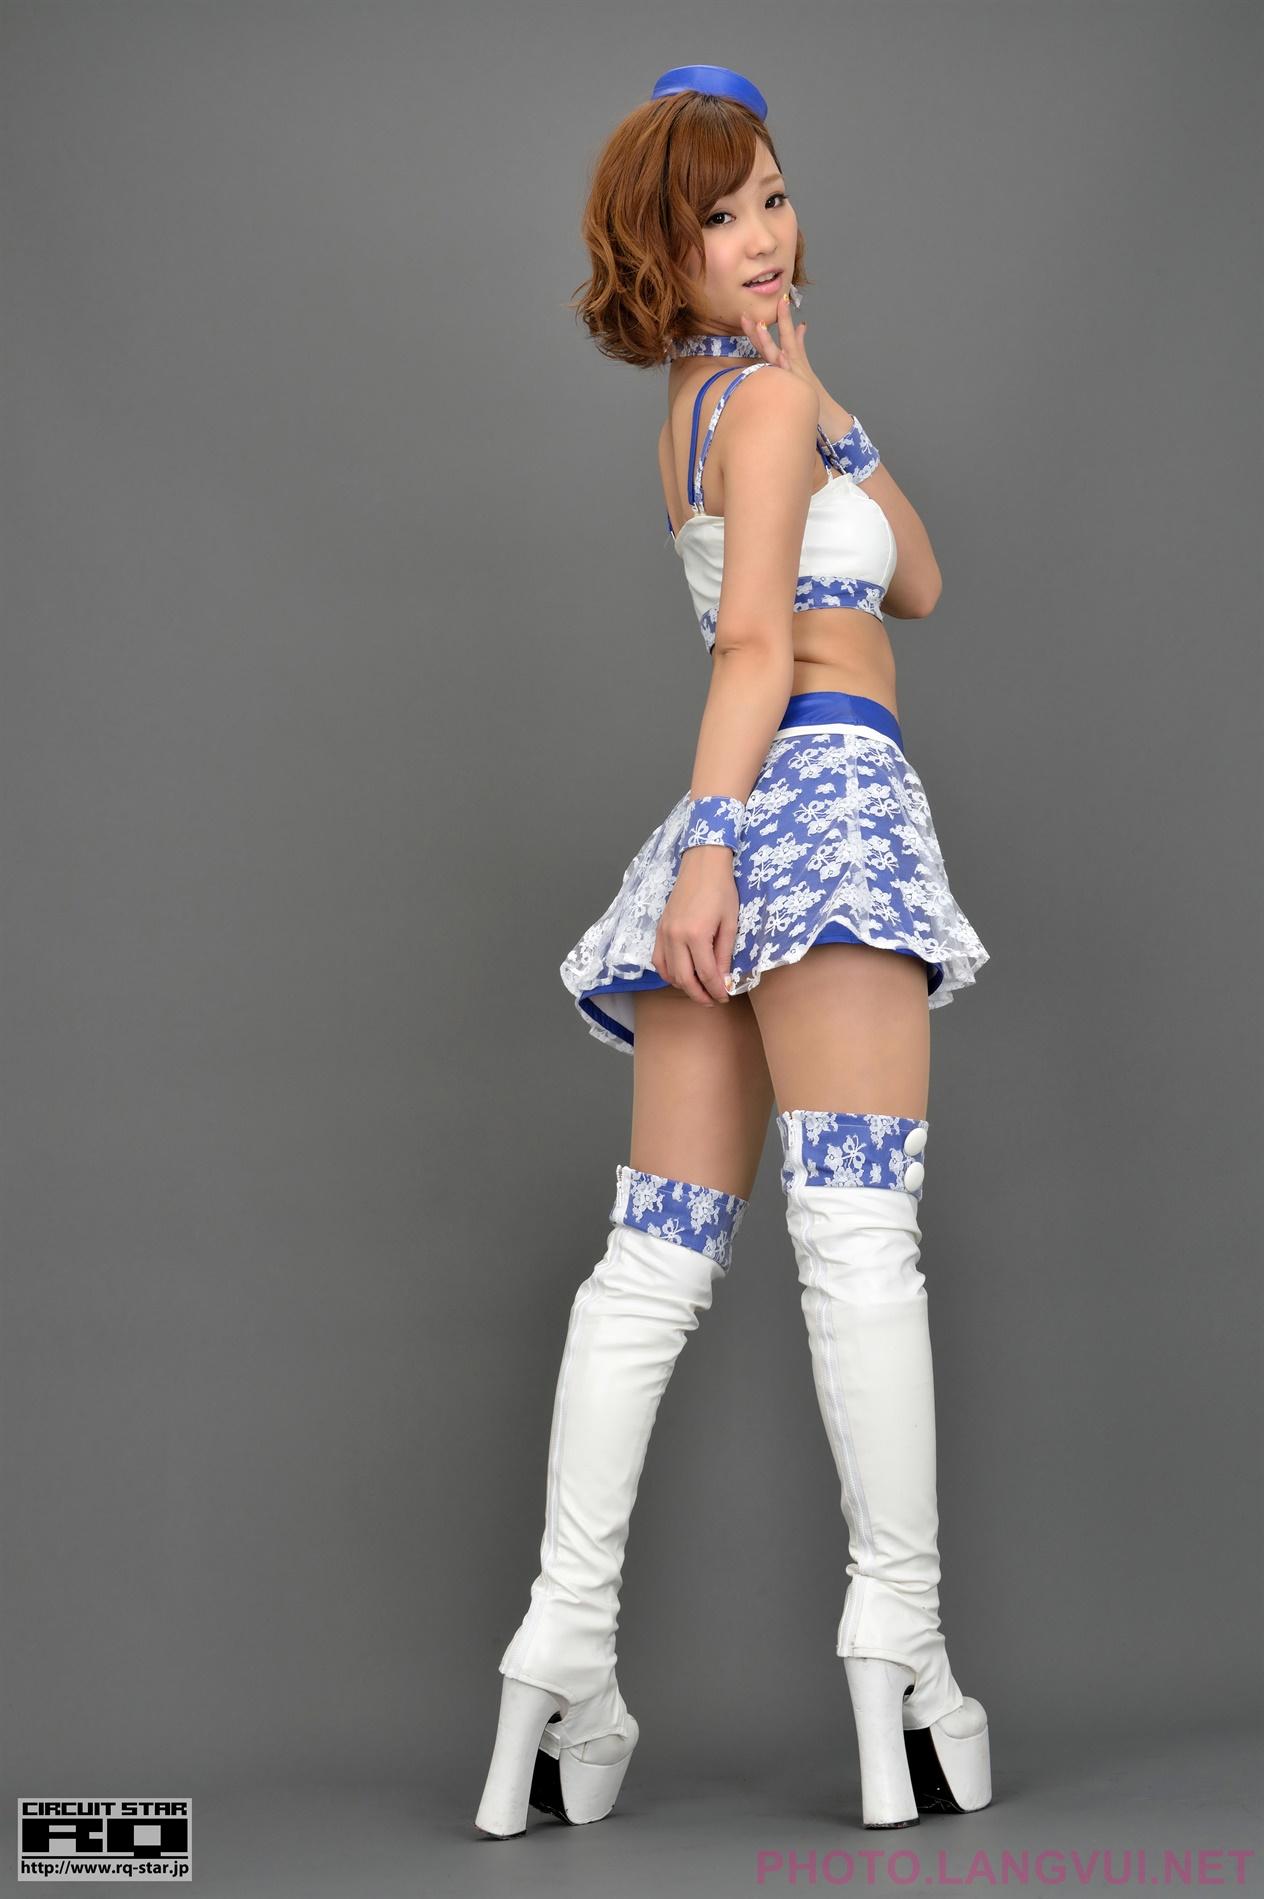 RQ STAR No 01003 Ichika Nishimura Race Queen